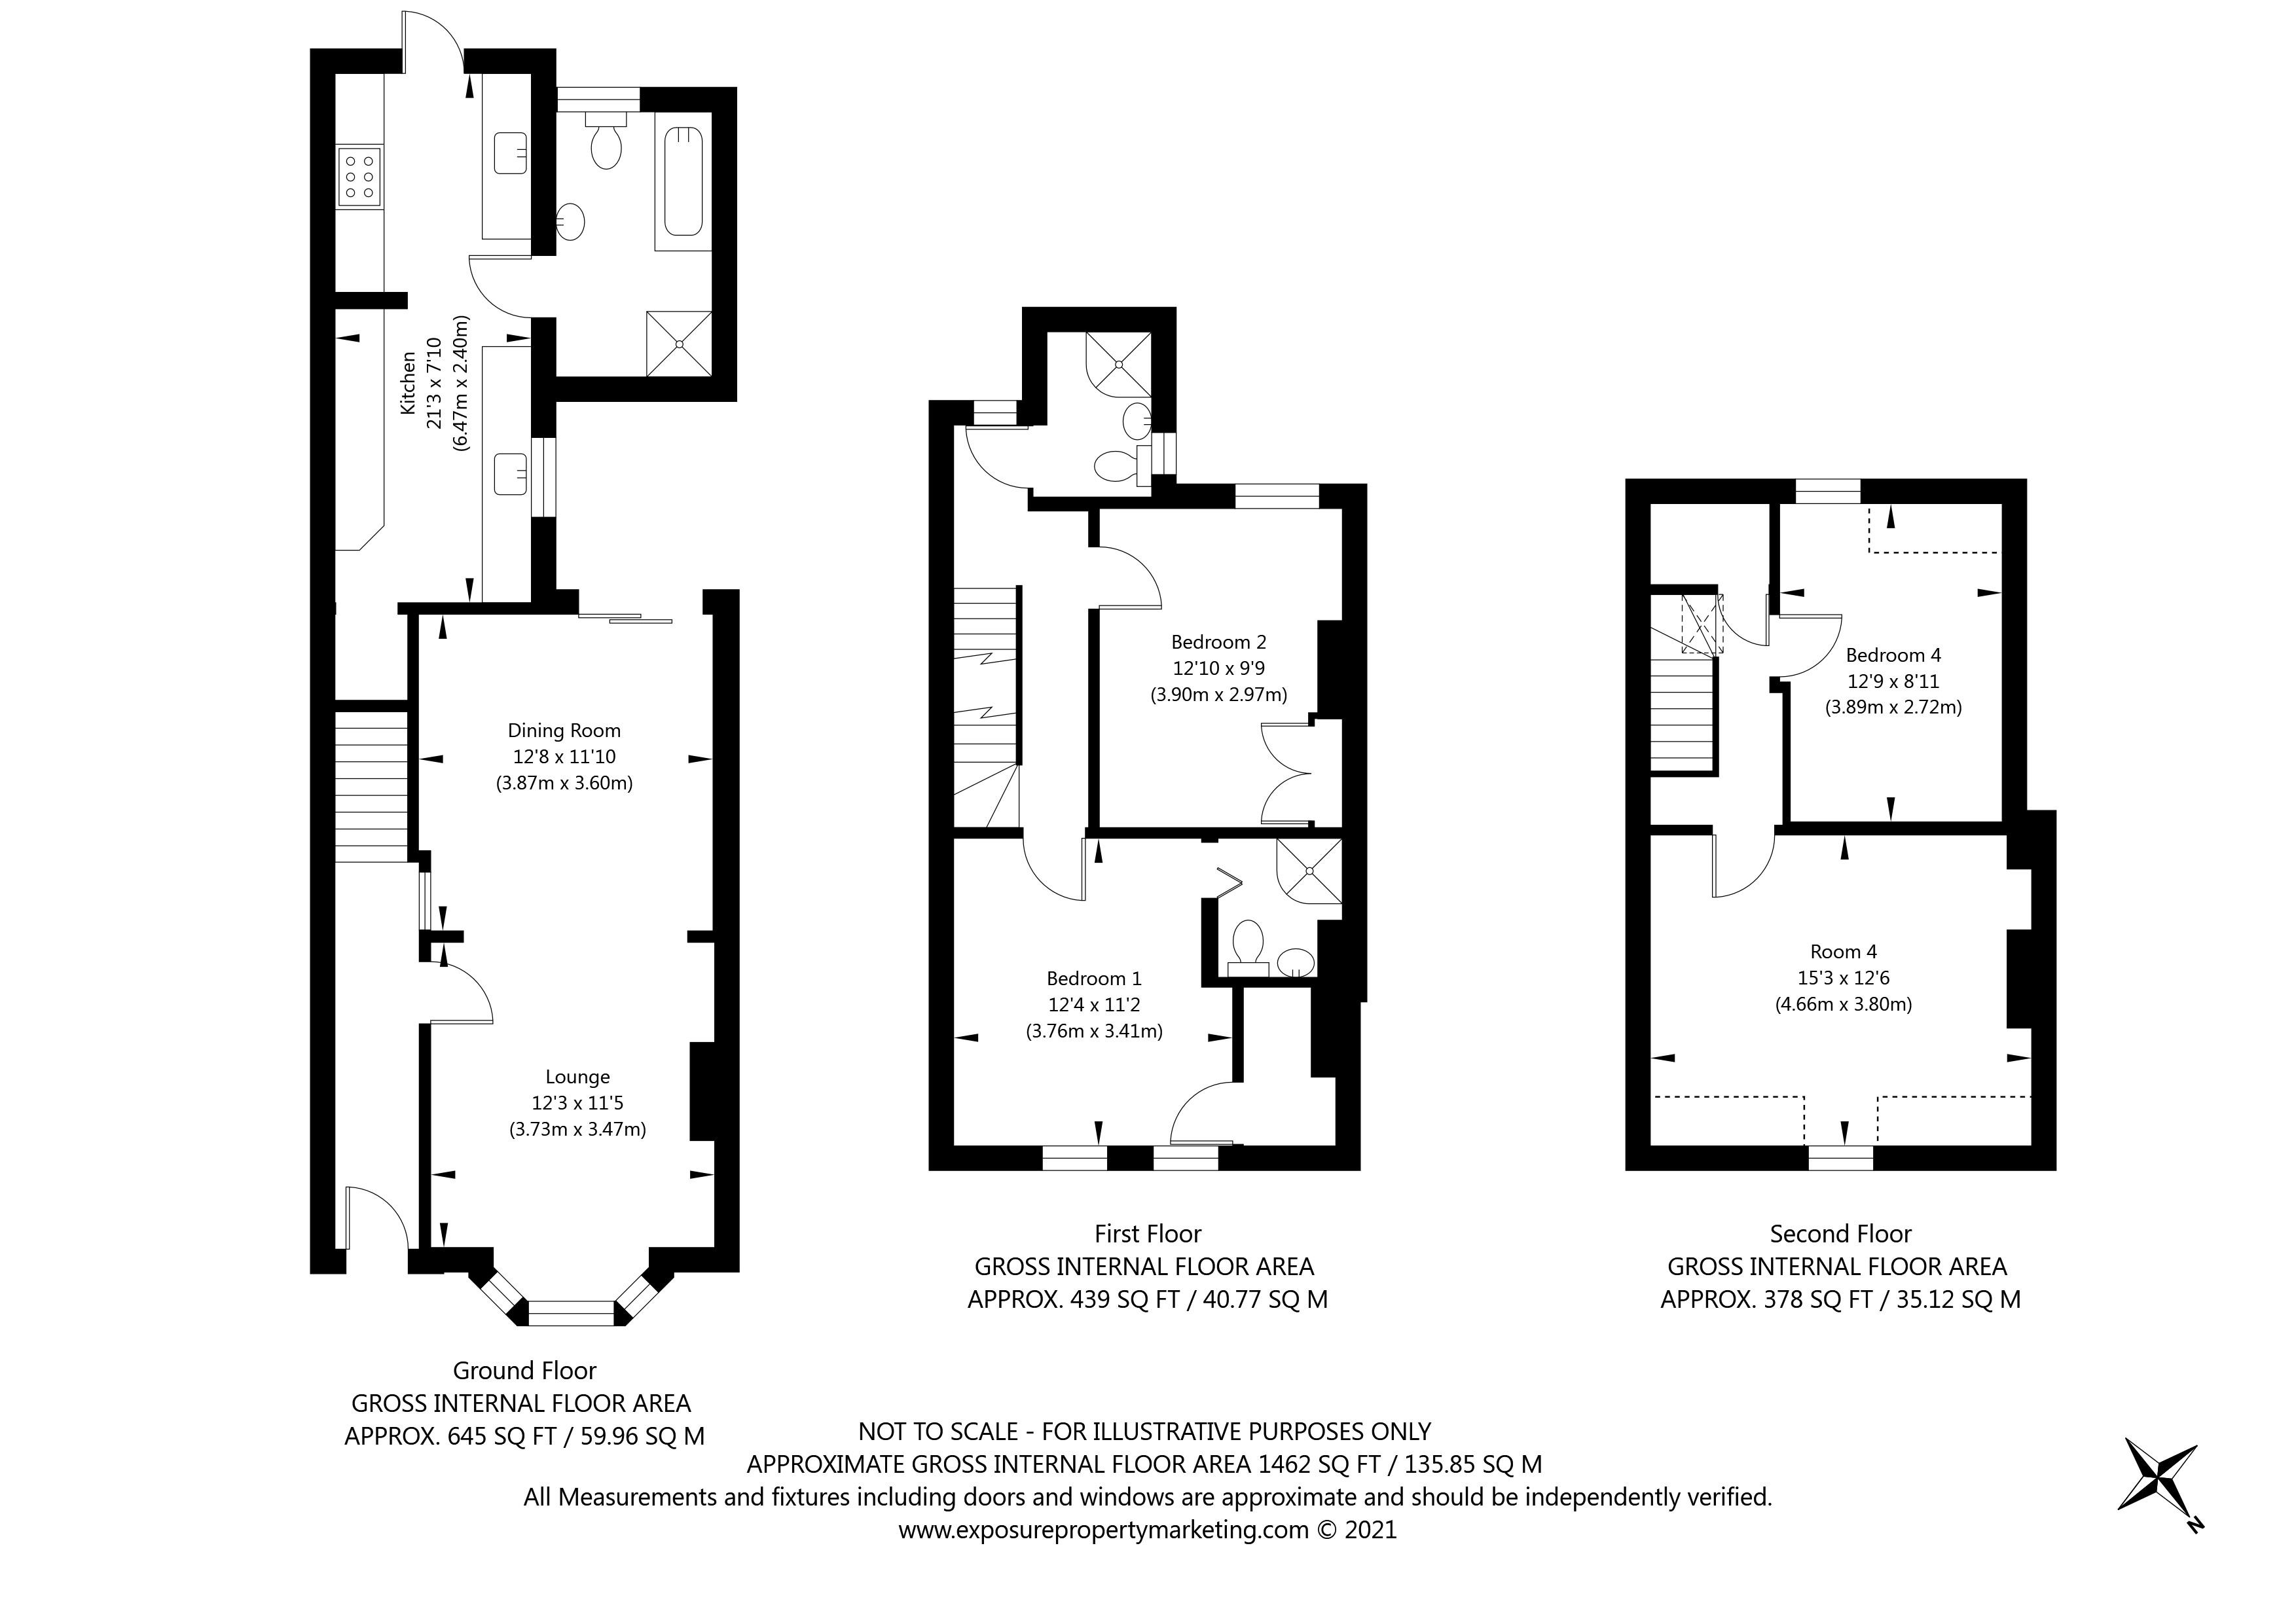 Claremont Terrace, York property floorplan